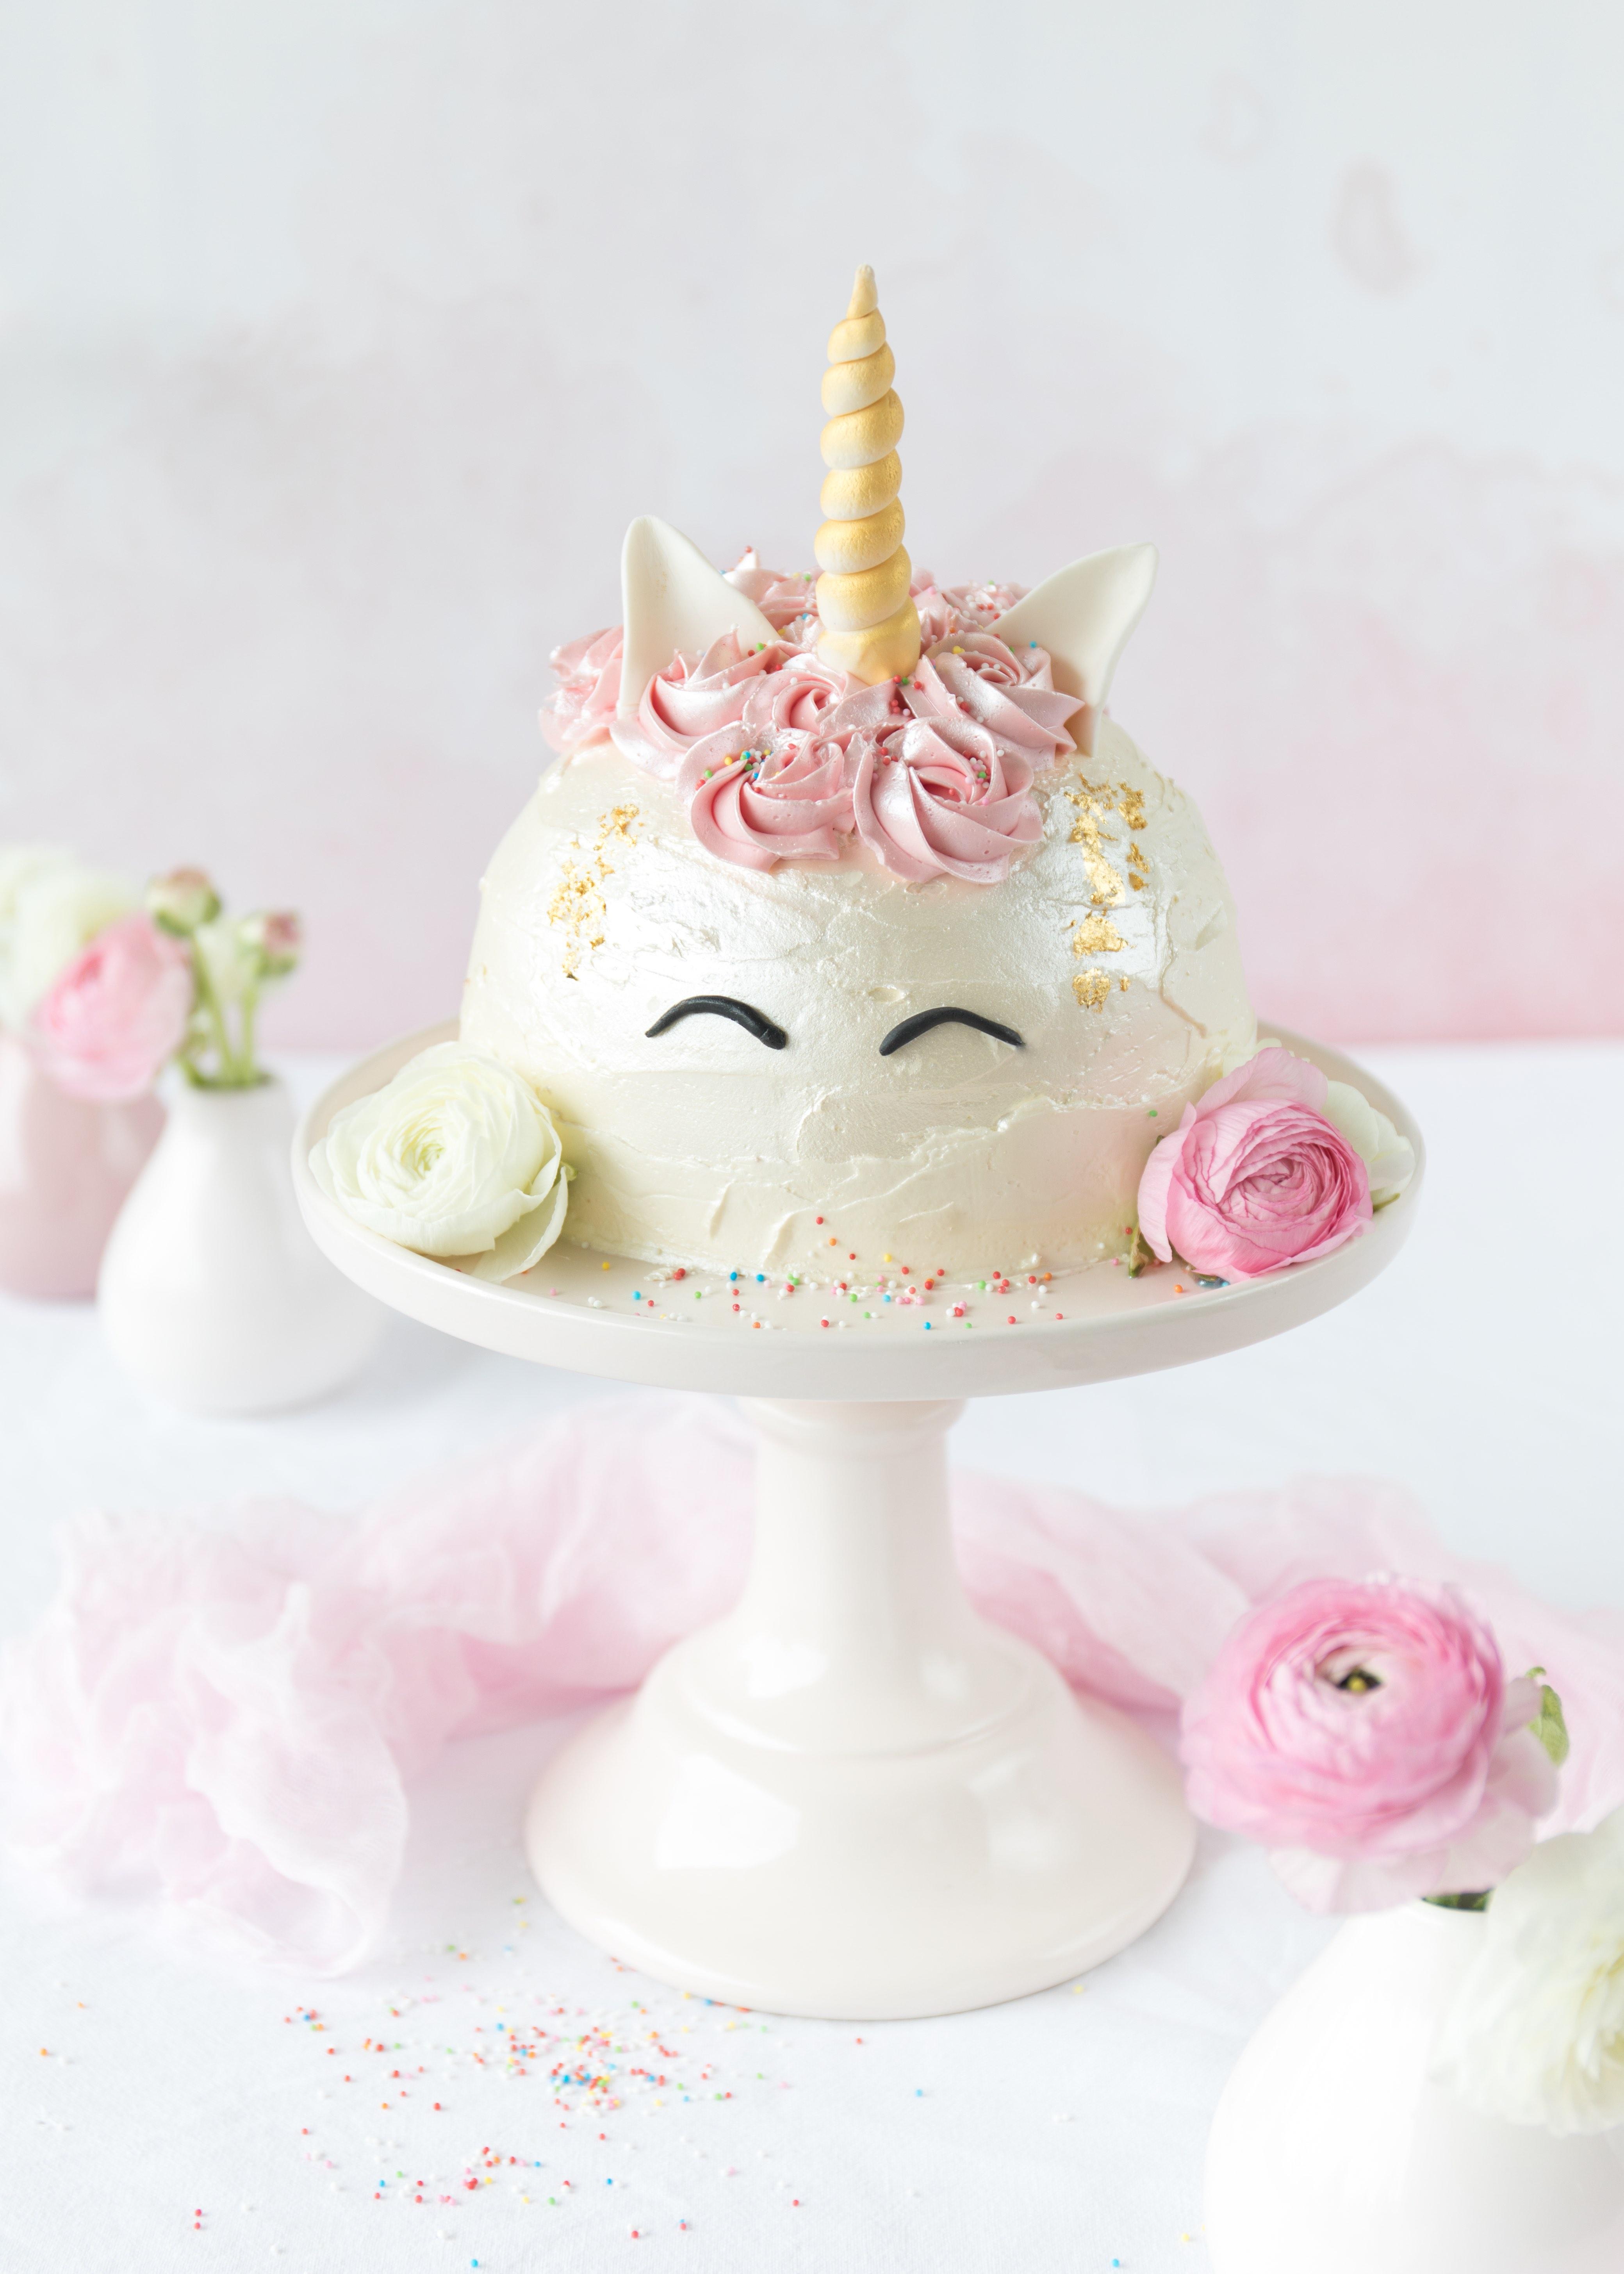 Einhorn Kuppel Torte backen Rezept Unicorn #einhorn #unicorn #torte #einhorntorte #kuppeltorte #backen #SwissMeringue | Emma´s Lieblingsstücke